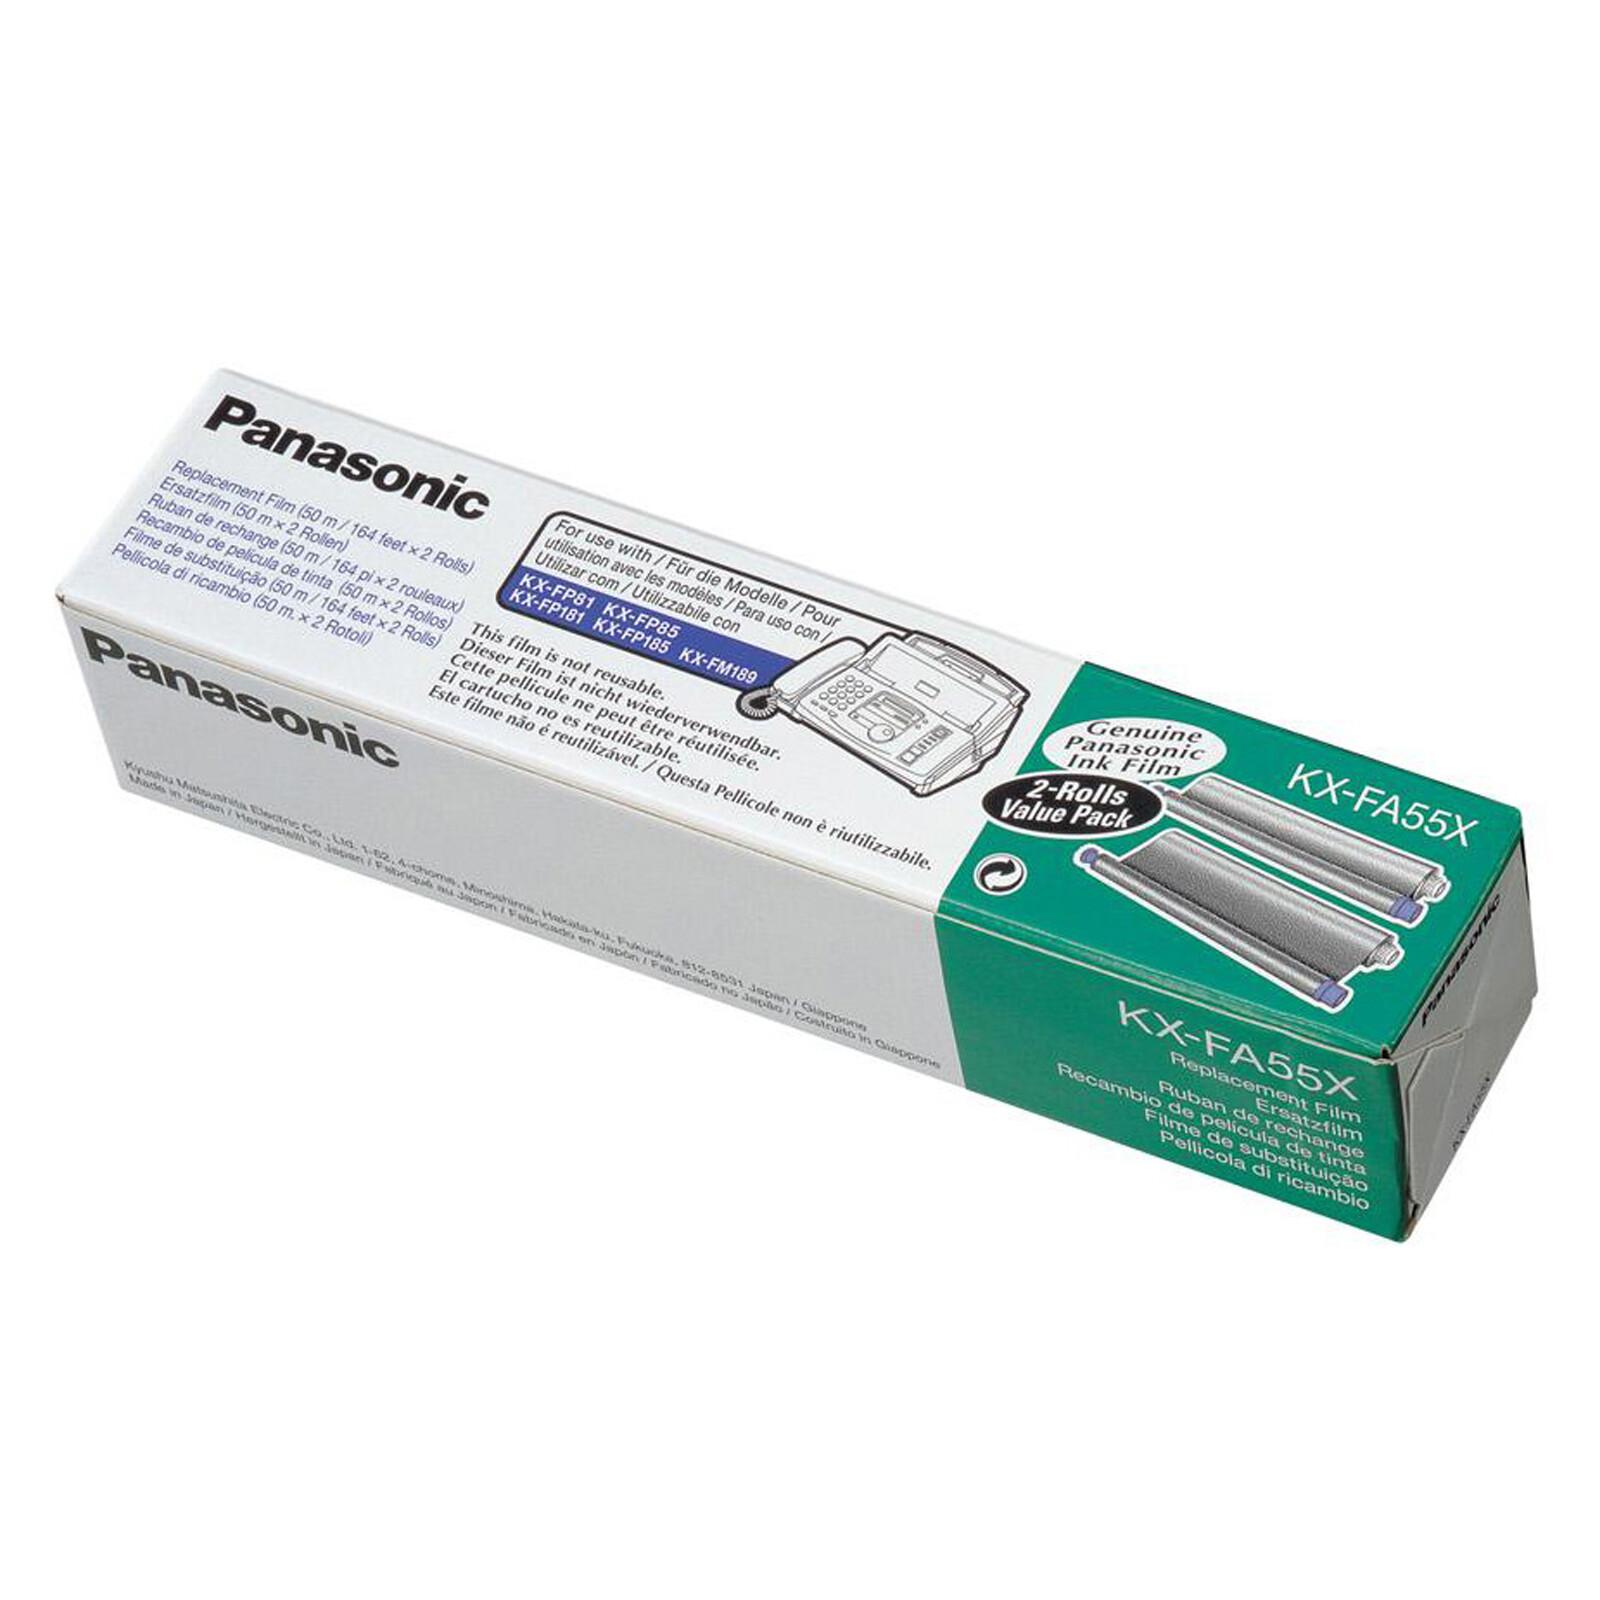 Panasonic KX-FA55X Thermorolle